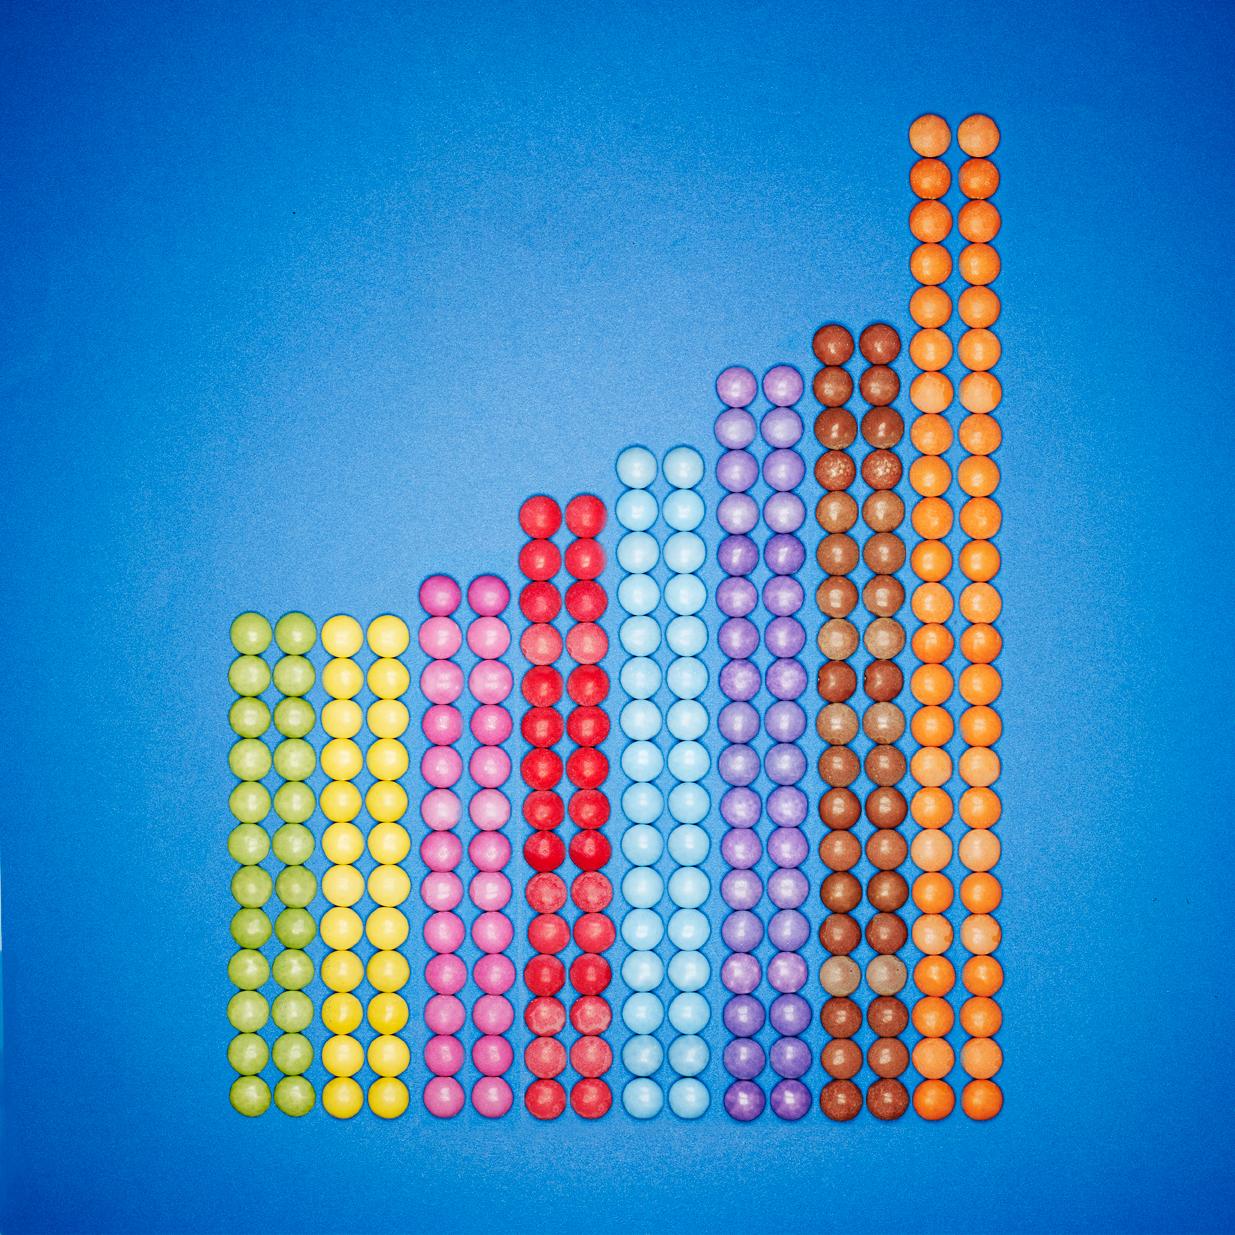 Smarties:  Orange 18.60% / Brown 14.72% / Purple 13.95% /  Blue 12.40% / Red 11.62% /Pink 10.07% / Yellow 9.30% / Green 9.30%.(4 x 43g)